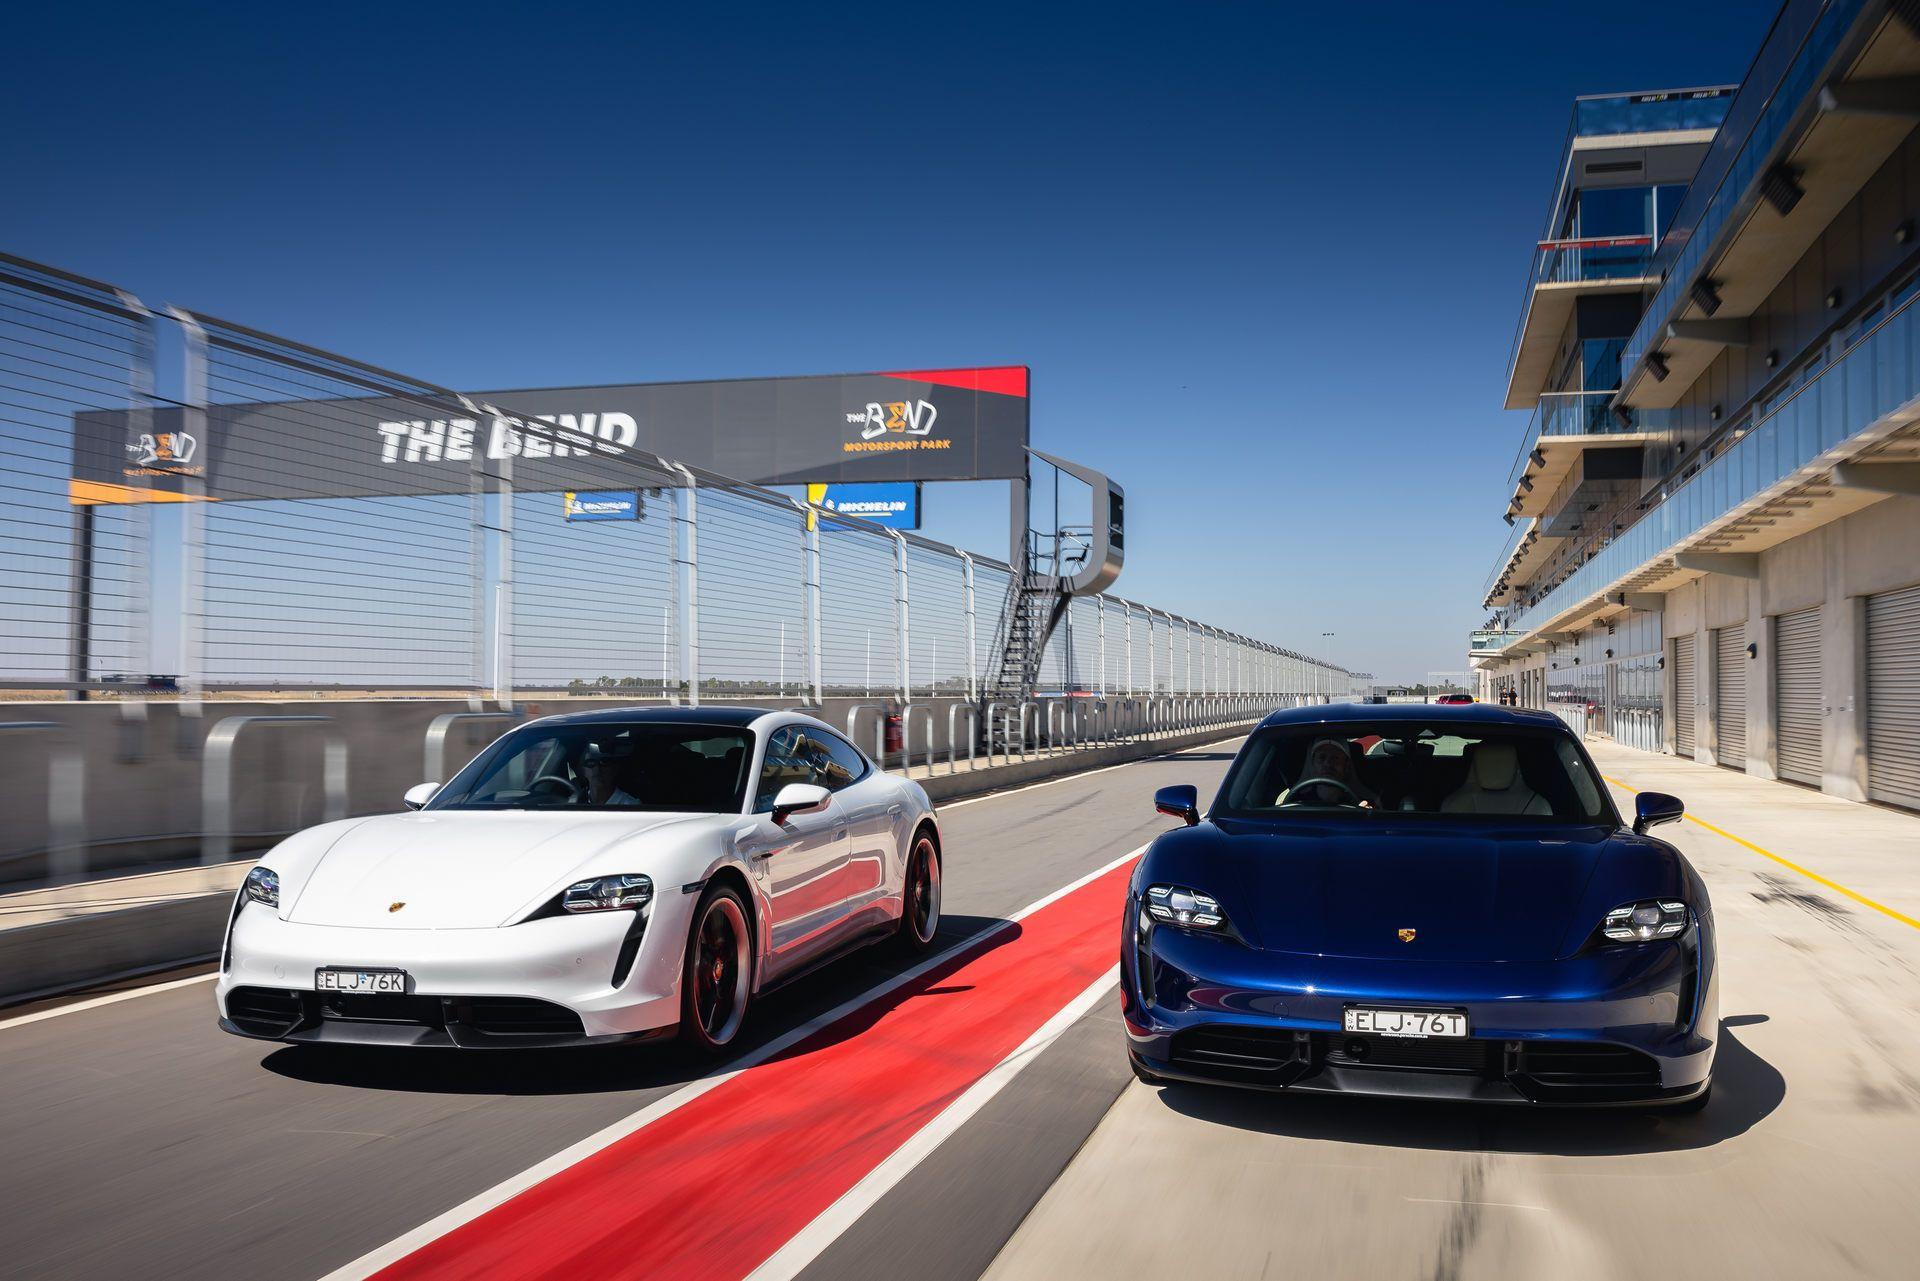 Porsche-Taycan-Turbo-S-The-Bend-Motorsport-Park-42